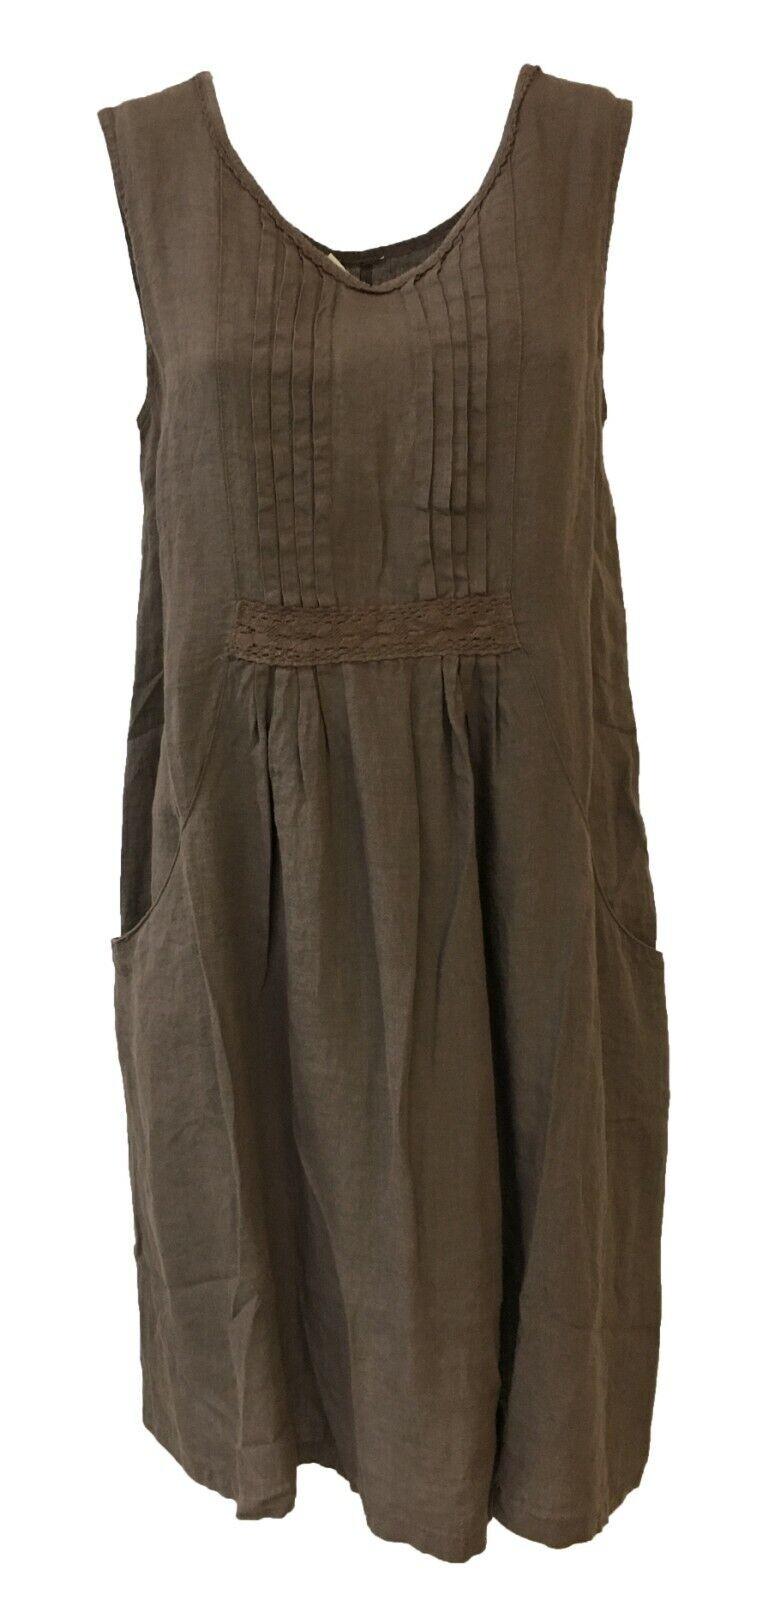 Kleid Frau ohne Muffe MGold Demut 1949 100% Leinen Made in  HA4052